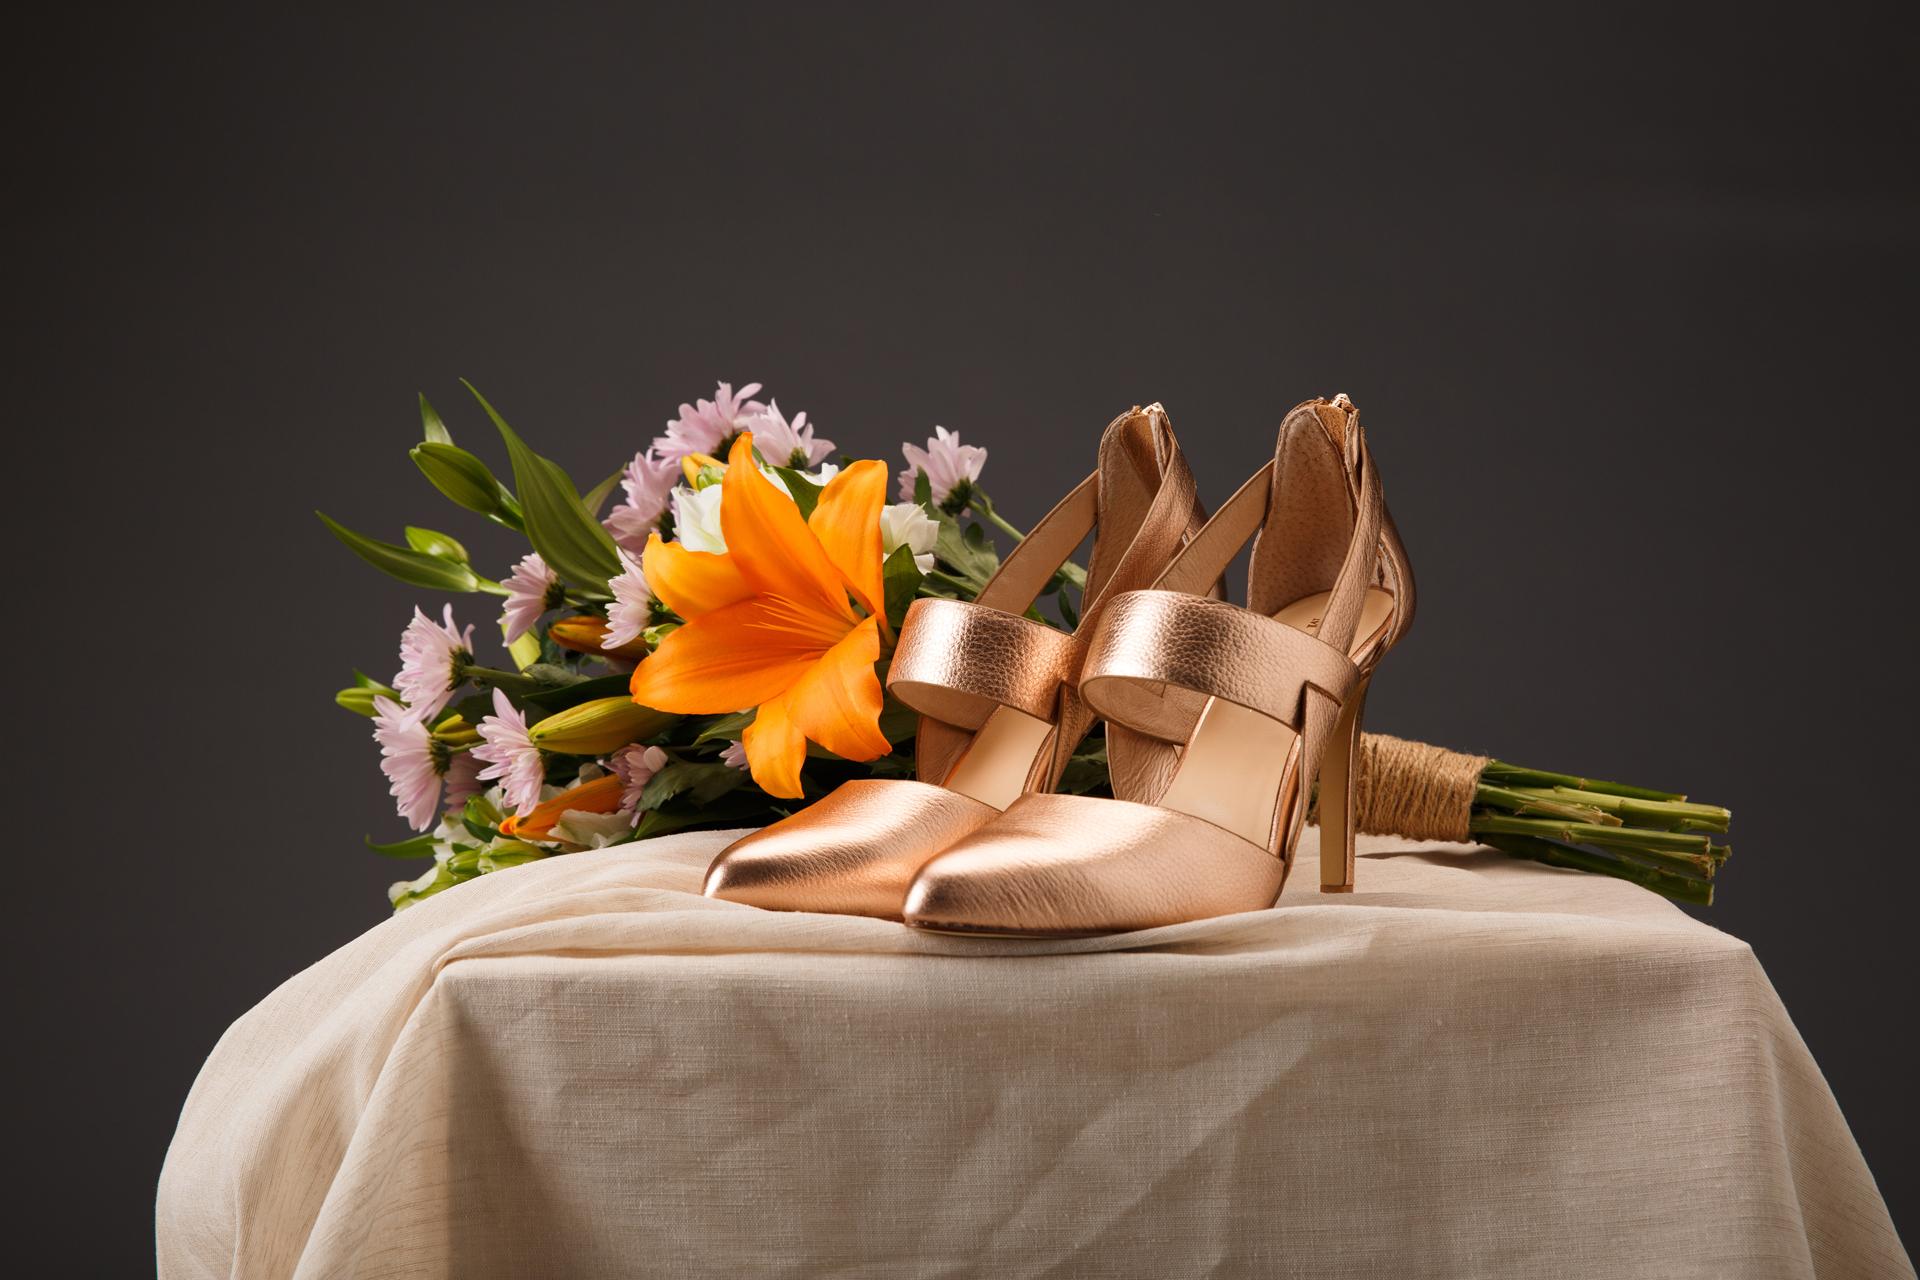 overland-footwear_Photography_Product_Studio_New-Zealand_51_web.jpg